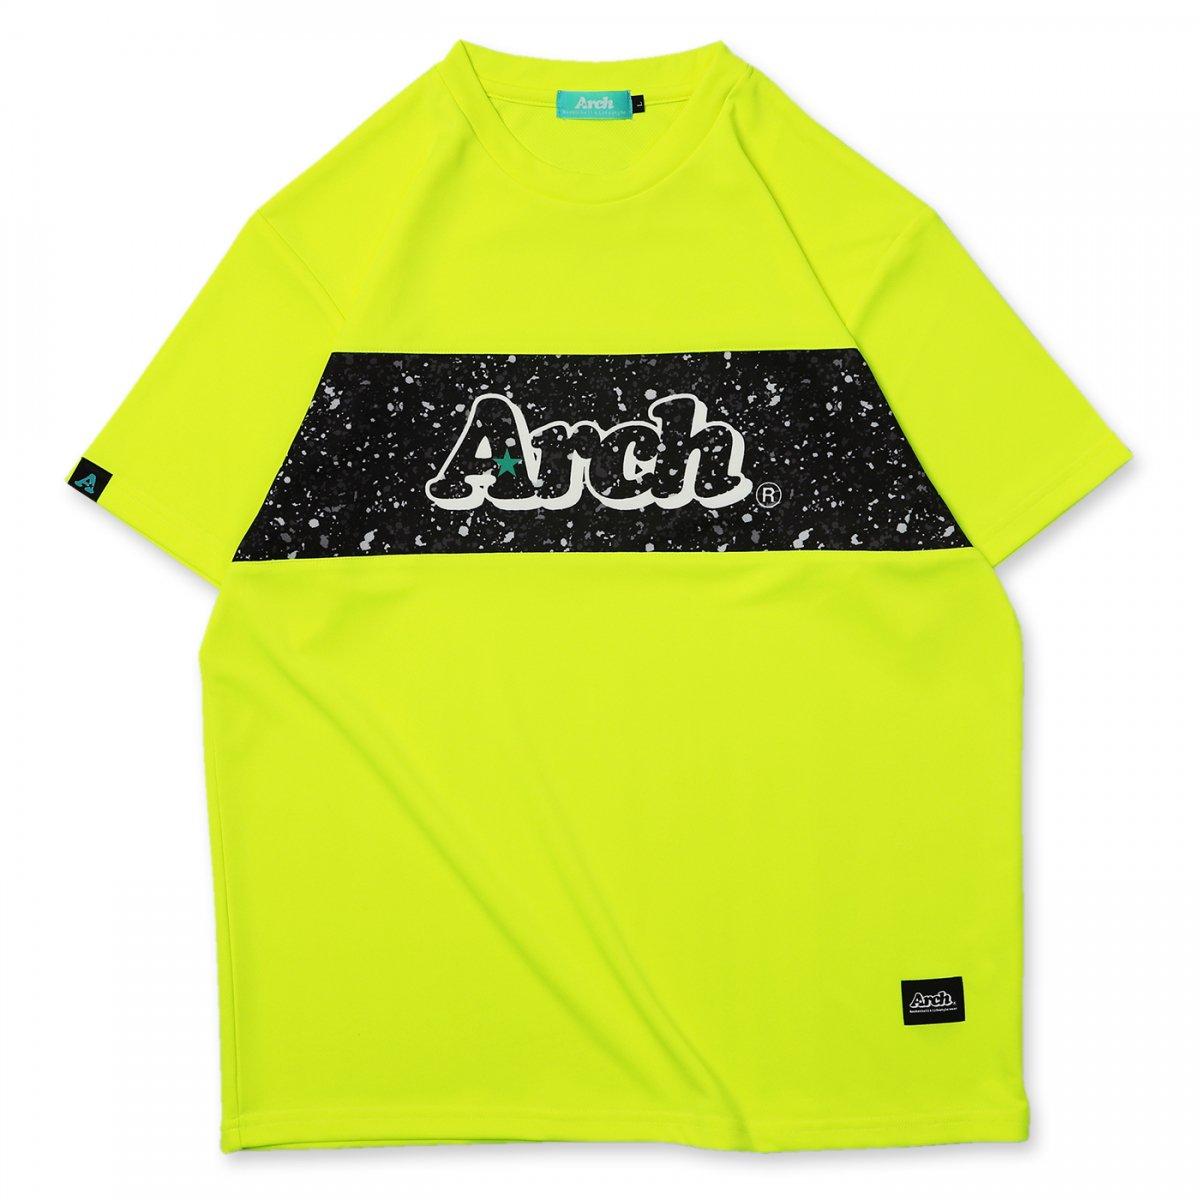 paint splatter tee [DRY]【neon yellow】